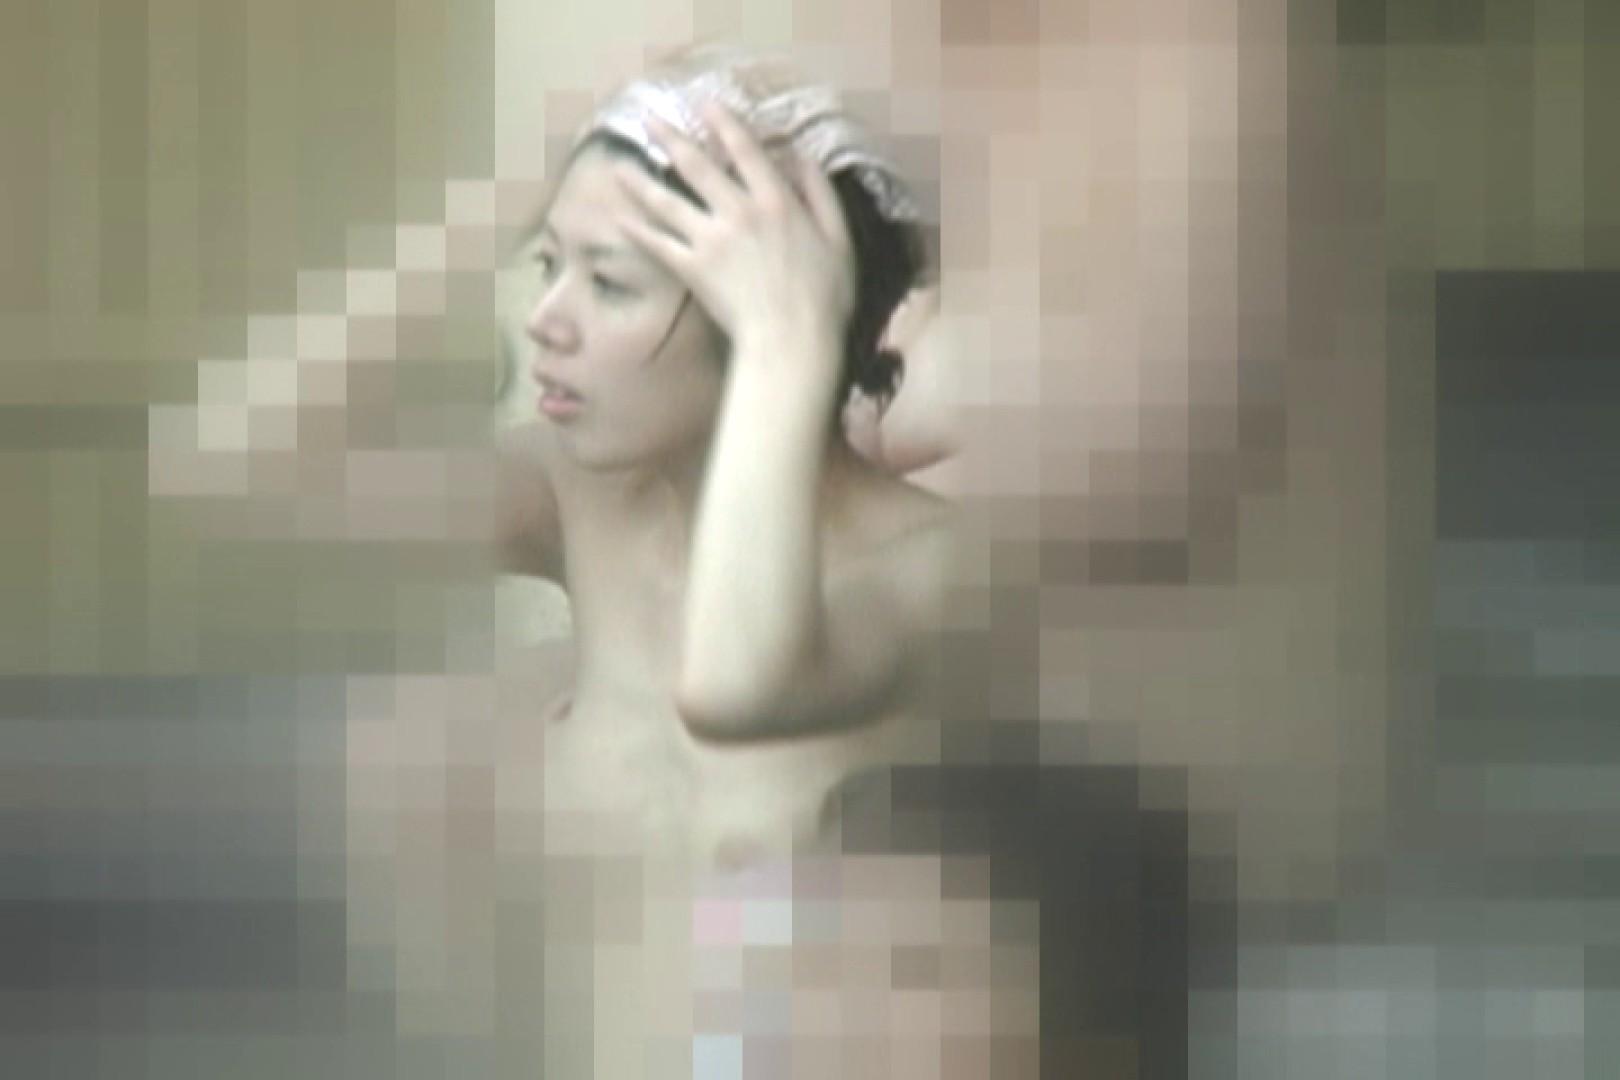 Aquaな露天風呂Vol.856 盗撮大放出 AV動画キャプチャ 41連発 3